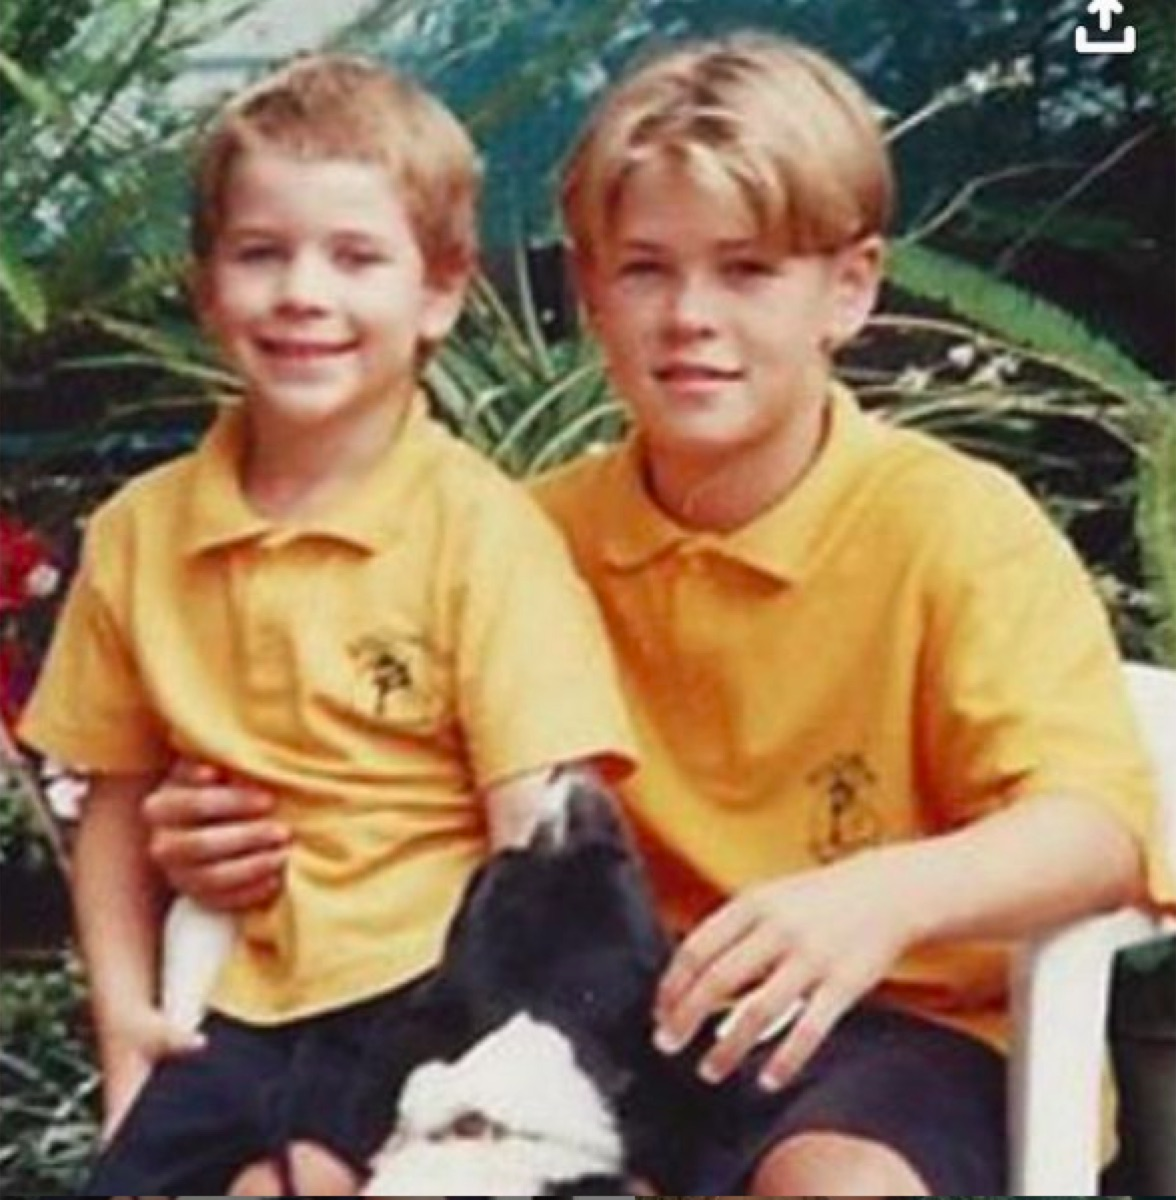 Liam and Chris Hemsworth as kids